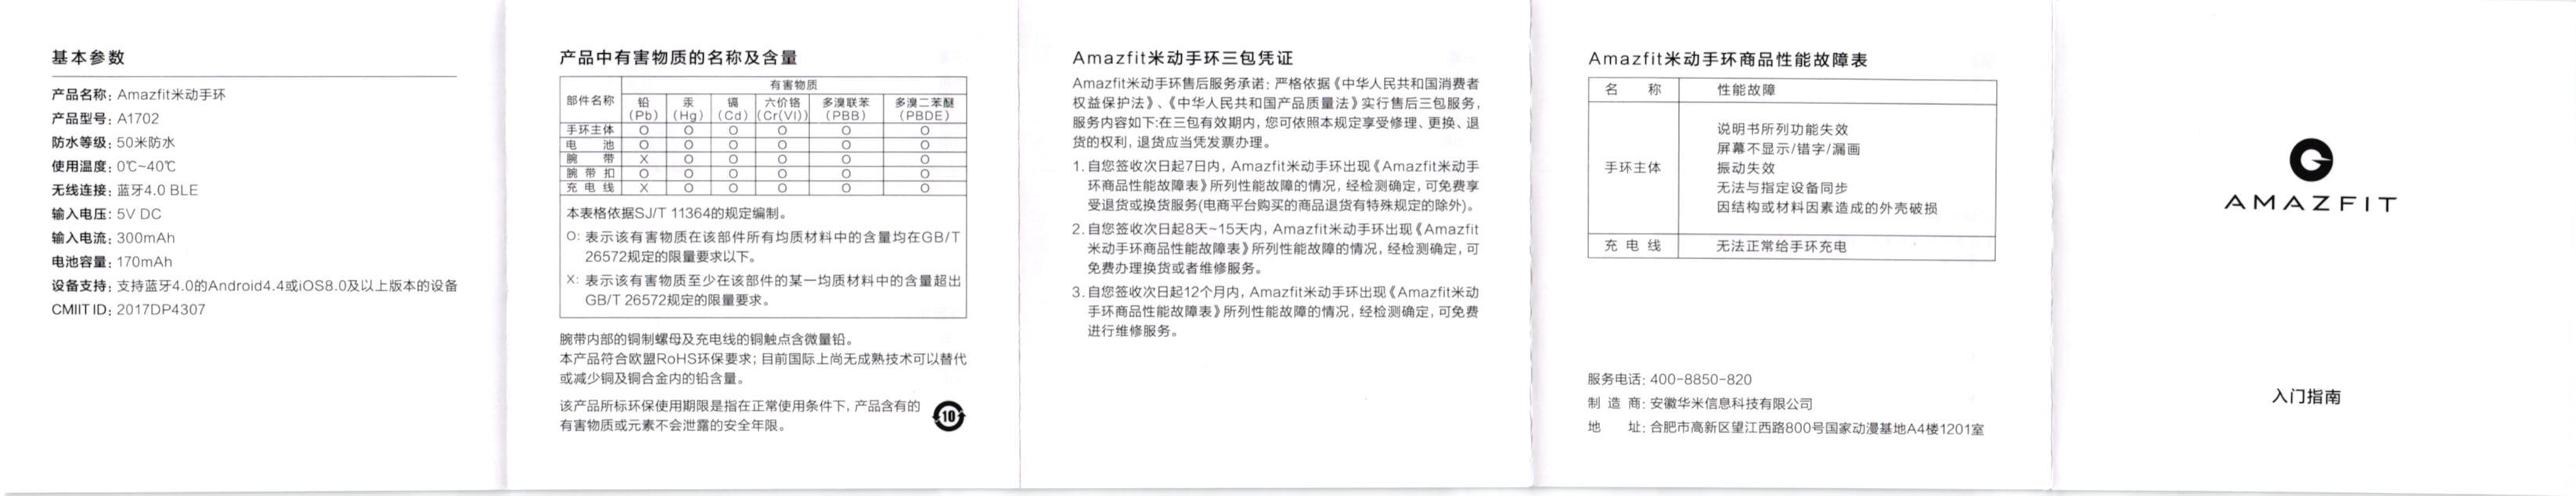 Xiaomi AMAZFIT Heart Rate Smartband 取説2